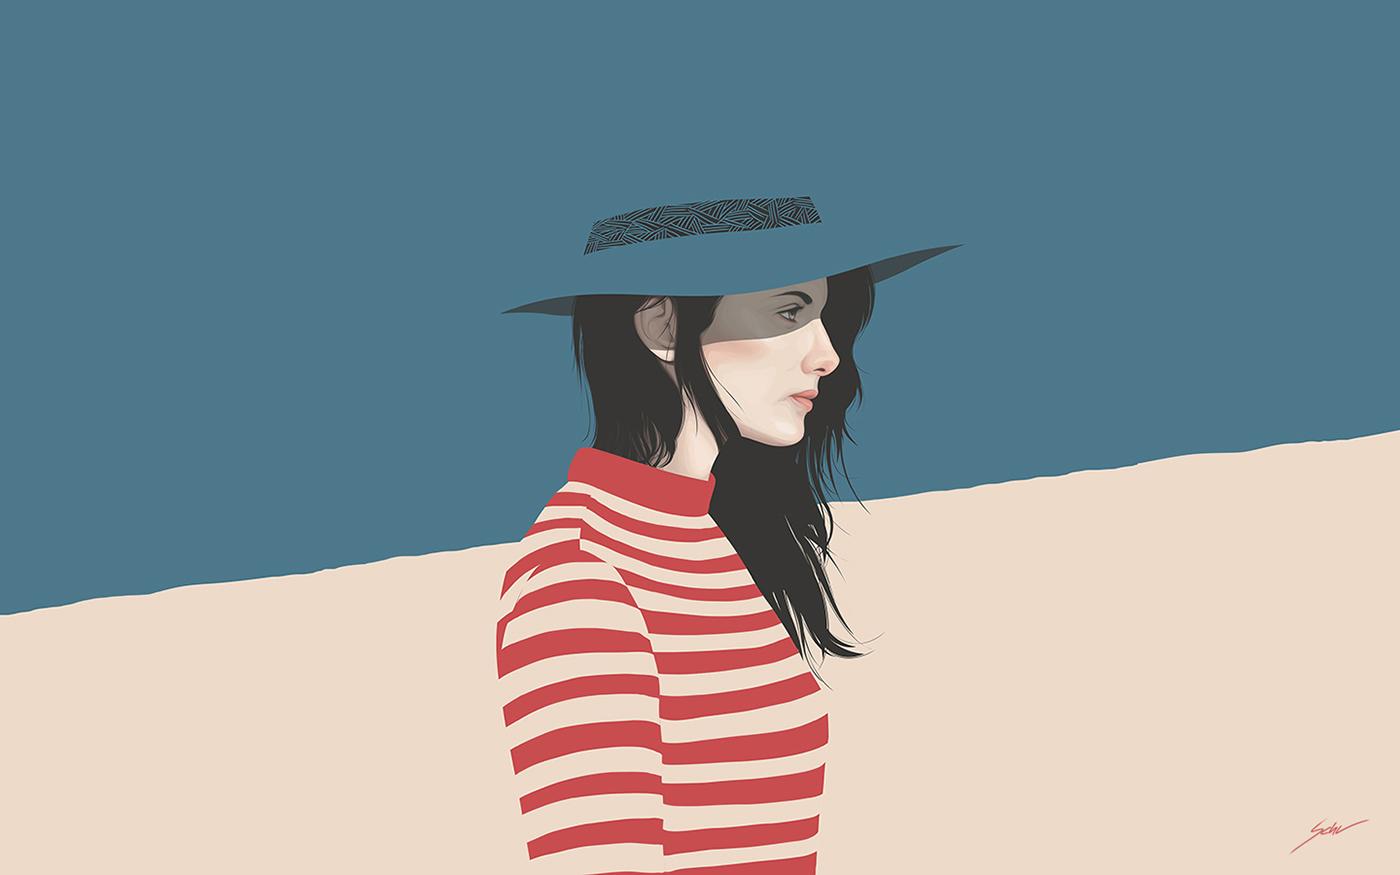 yuschav arly wallpaper Minimalism simple blue red portrait girl portraits vector vexel experimental personal